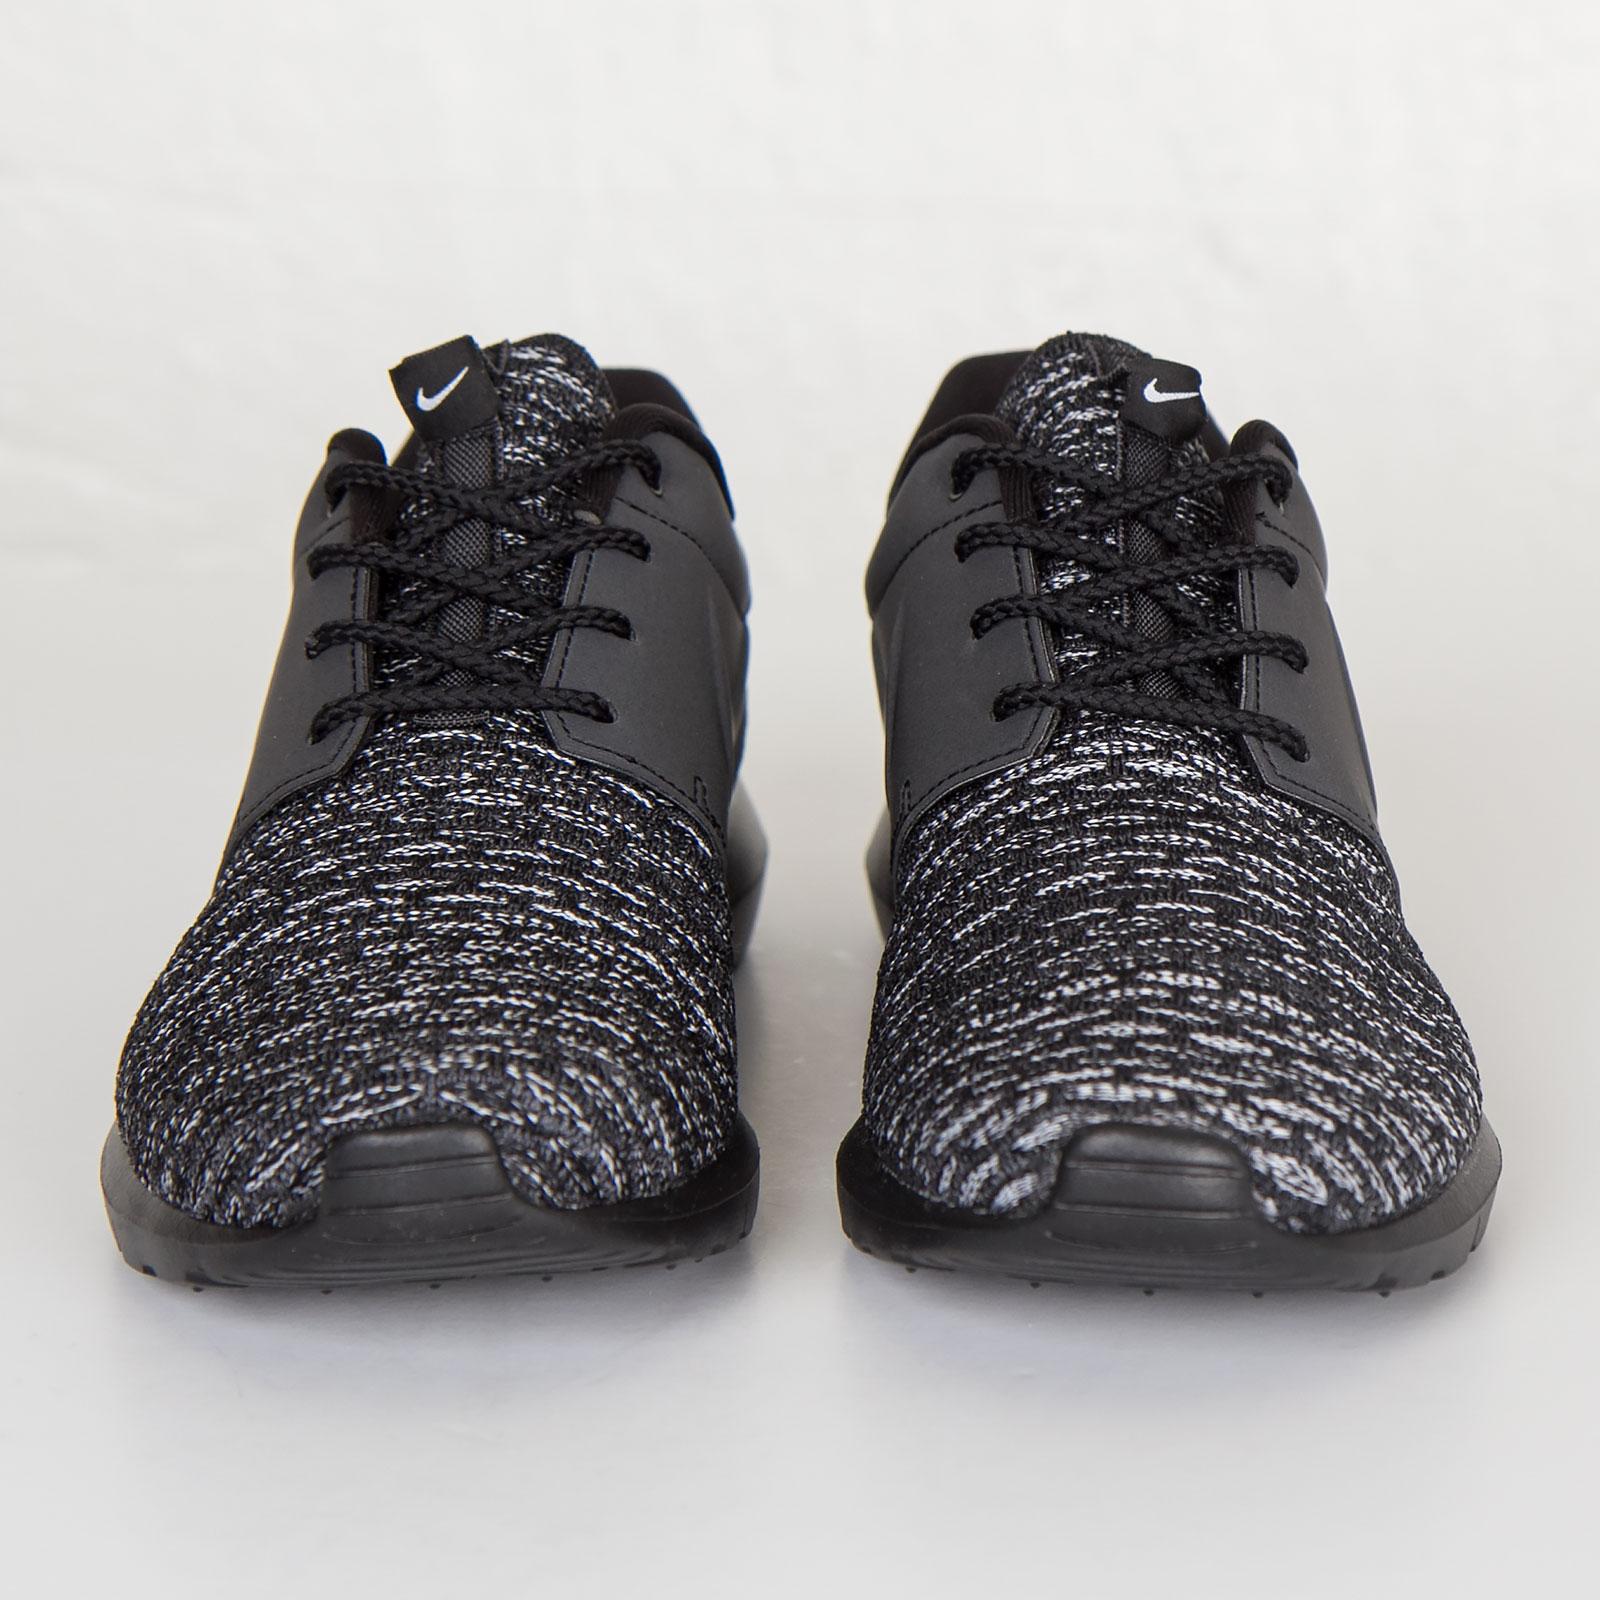 nike roshe nm flyknit premium sneakers the centre for contemporary rh zzf potsdam de